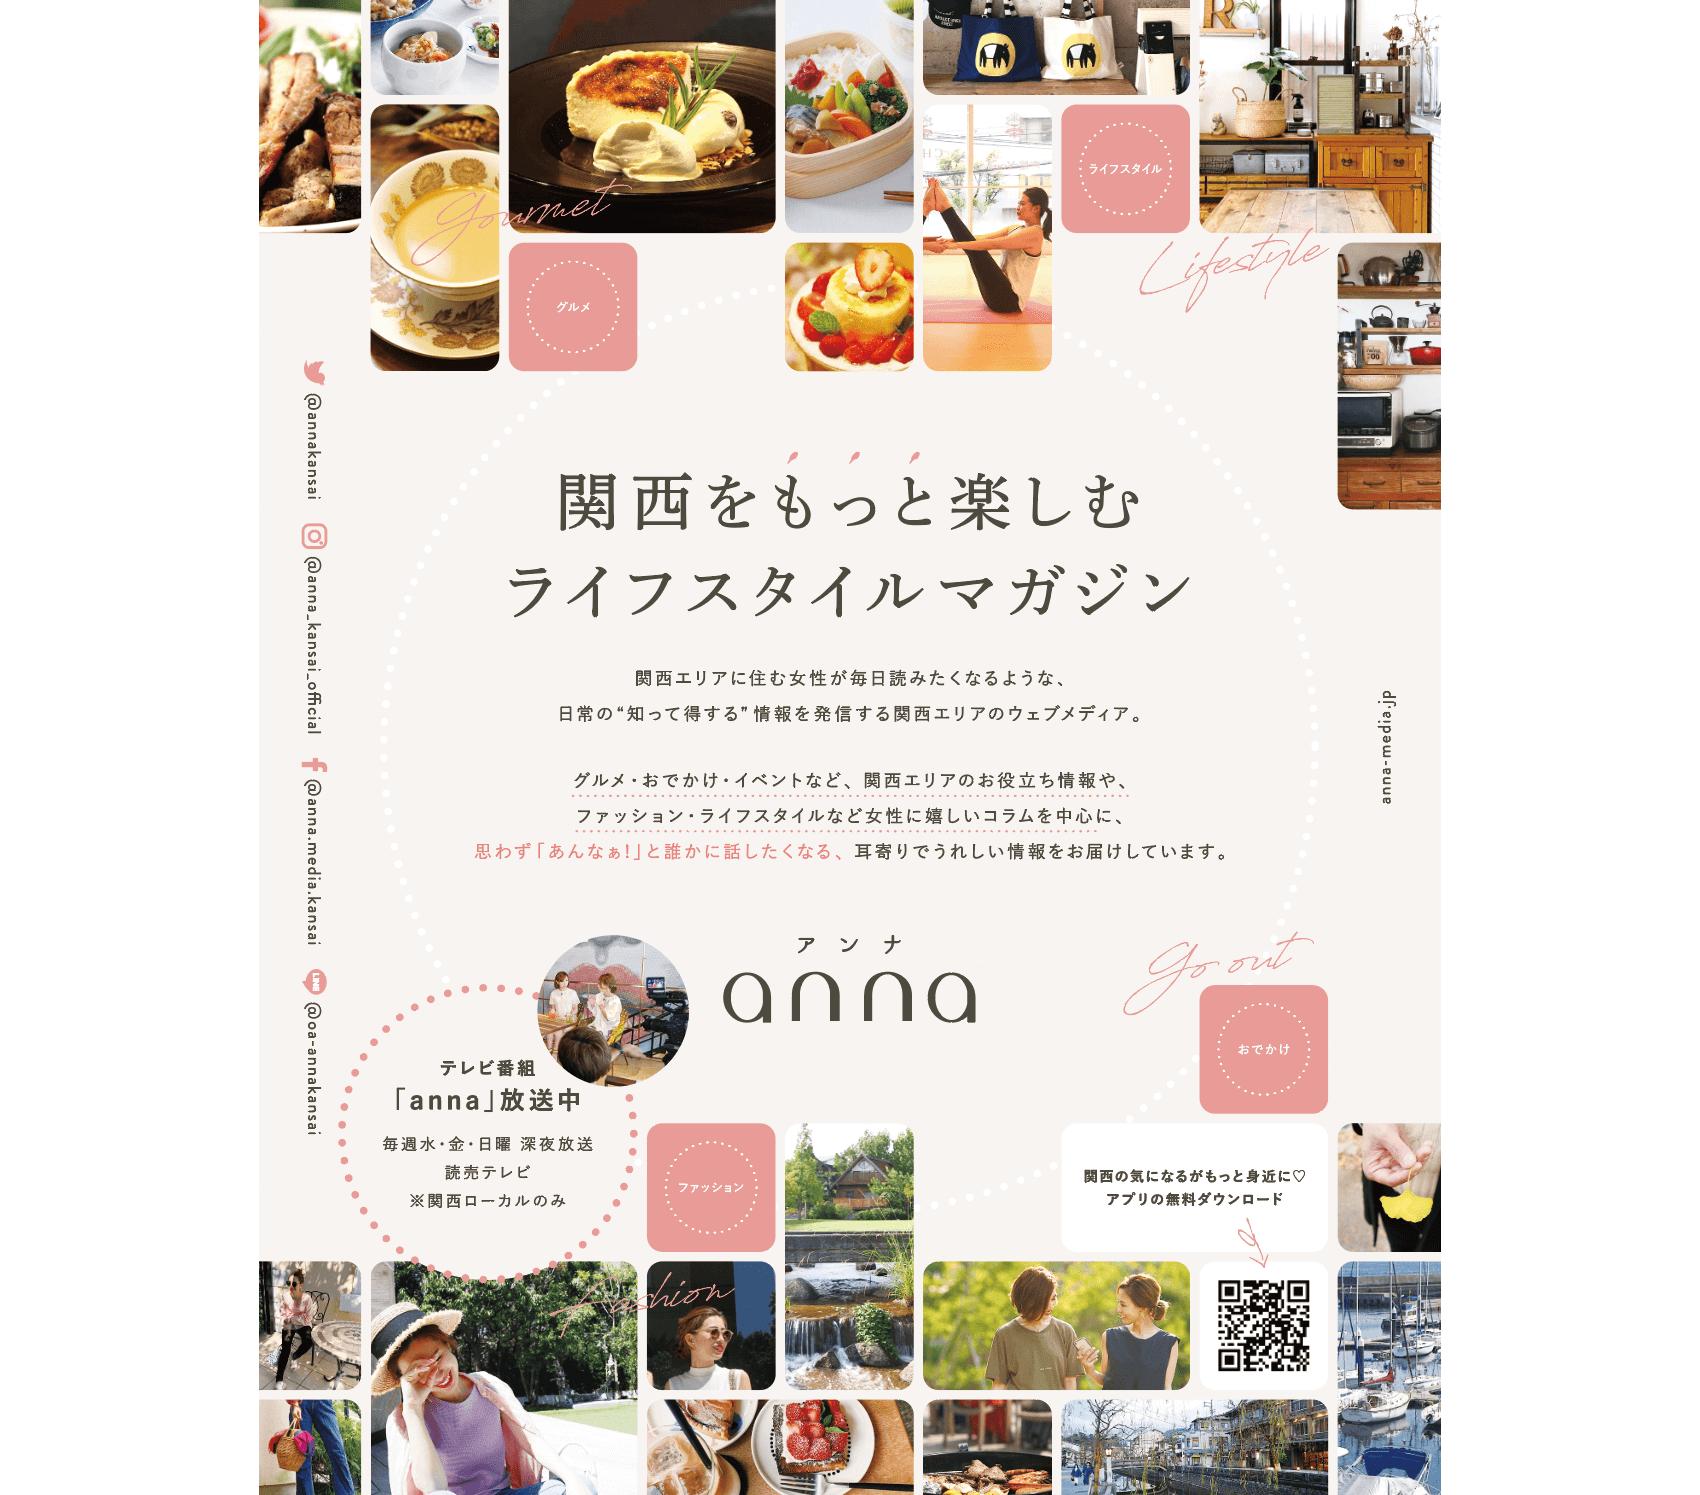 anna(アンナ)の雑誌広告デザイン